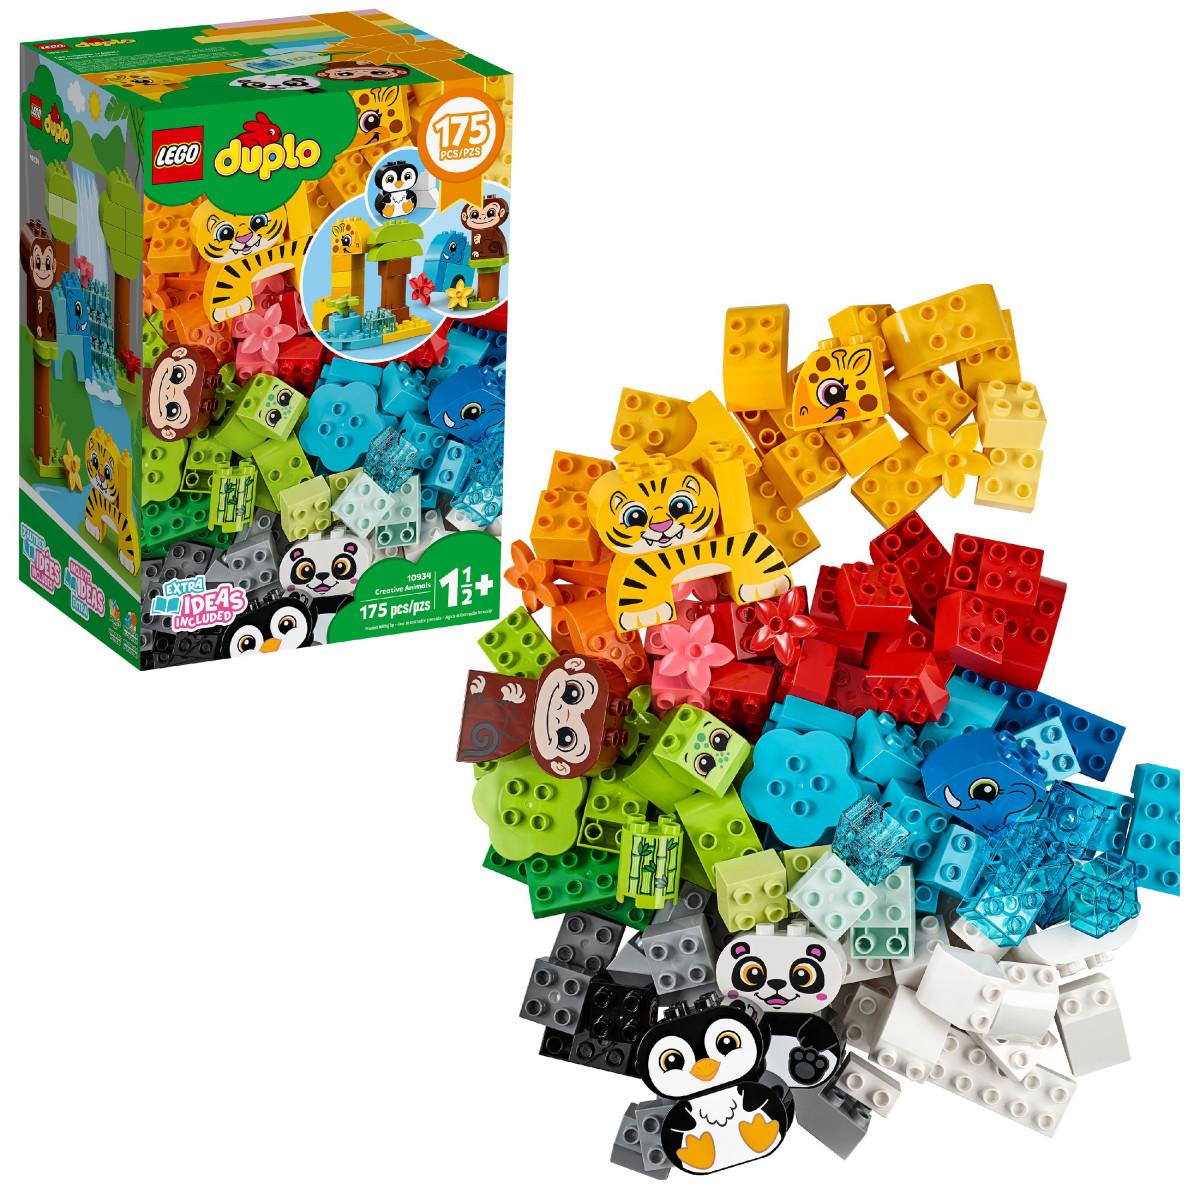 Walmart Black Friday! LEGO DUPLO Classic Creative Animals ONLY $15 (REG. $58)